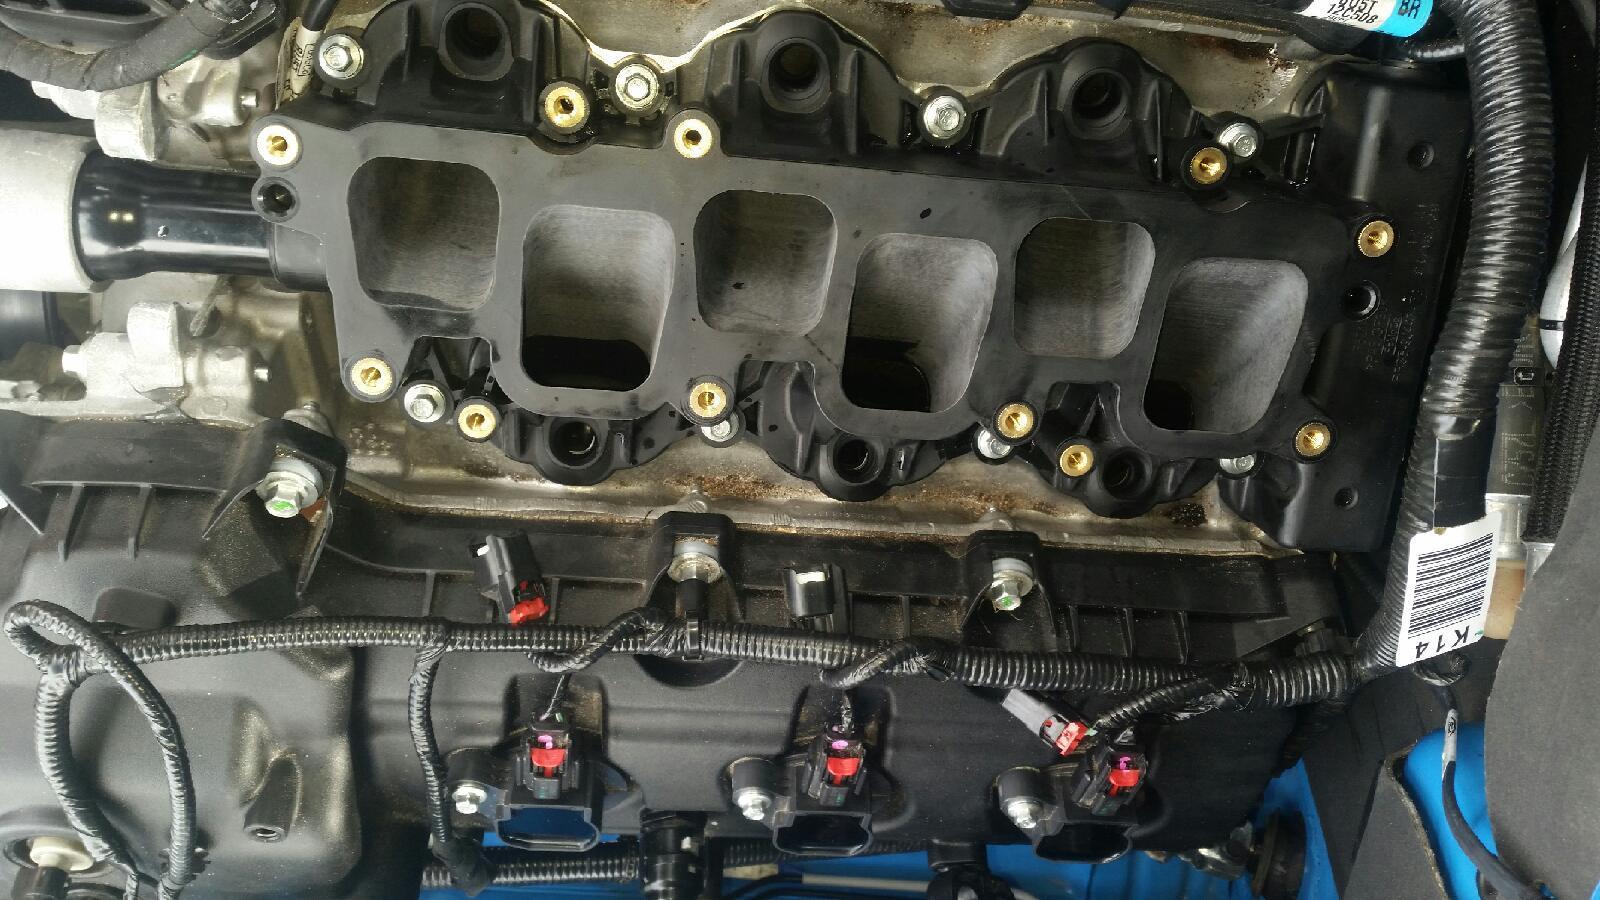 Ported intake manifolds - Mustang Evolution